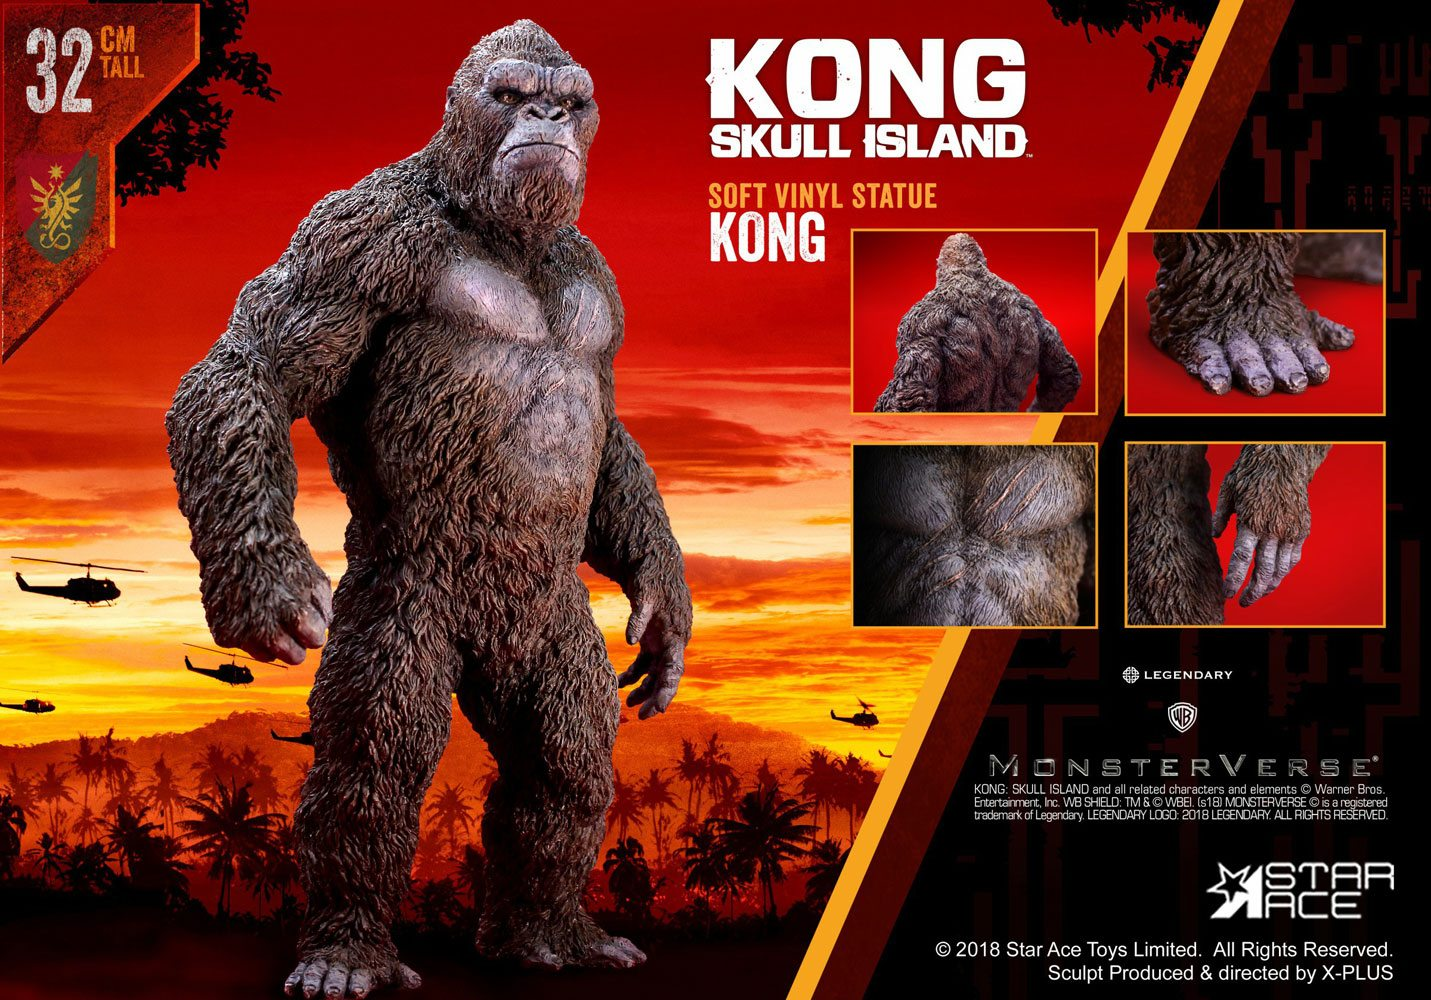 Kong Skull Island Soft Vinyl Statue Kong 32 cm